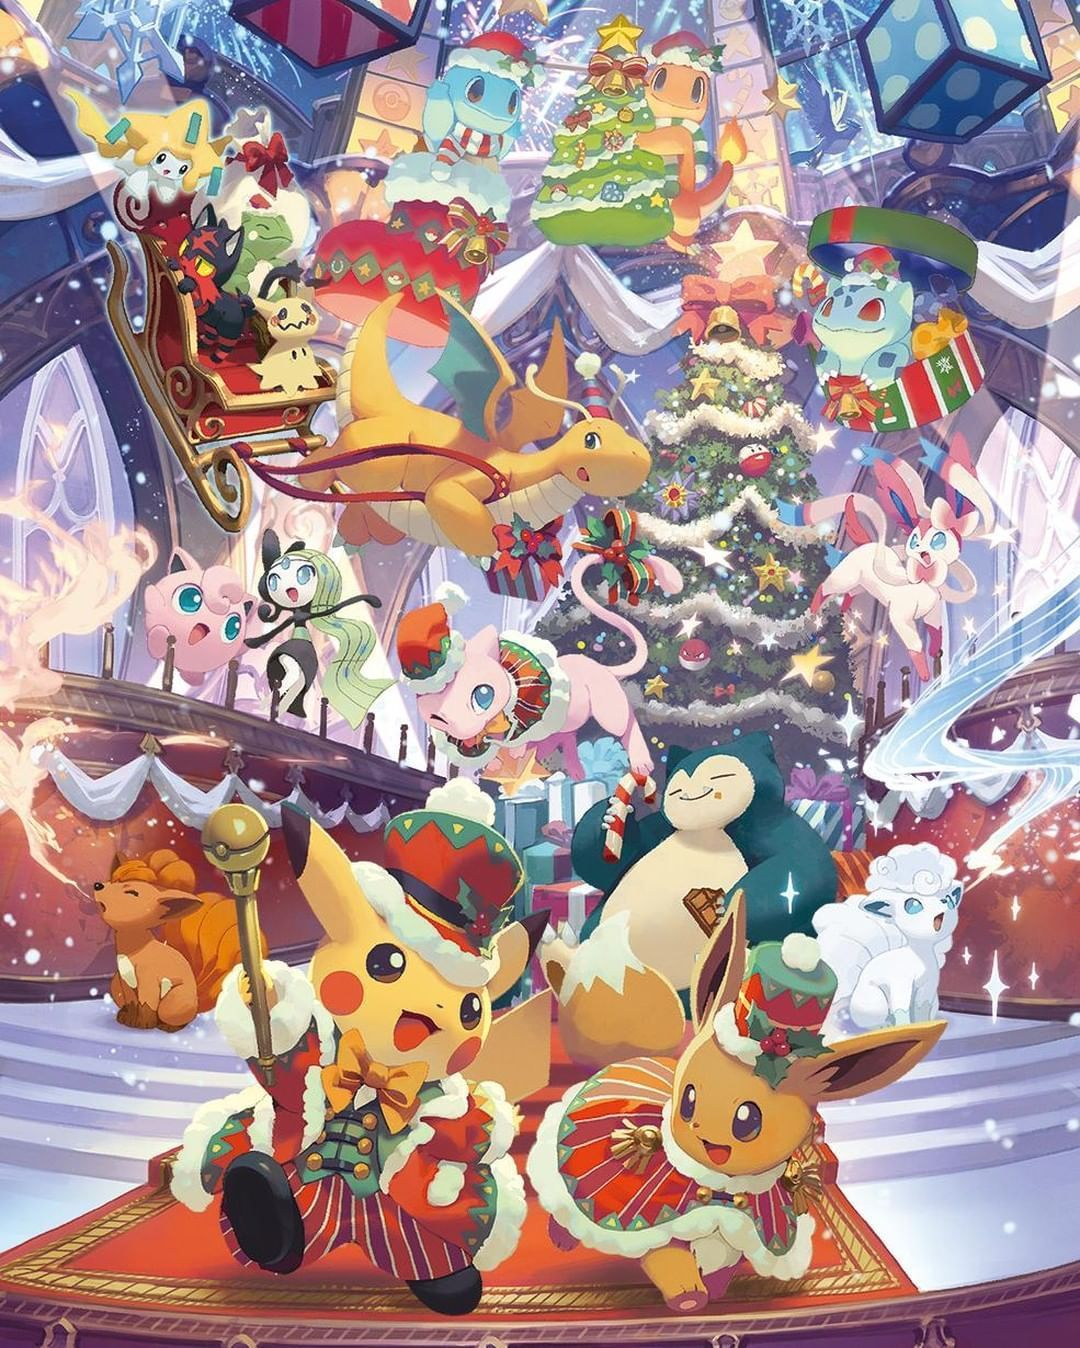 Pokemon Pokemon Pokemonart Thepokemoncompany Christmas Pokemon Cute Pokemon Wallpaper Pokemon